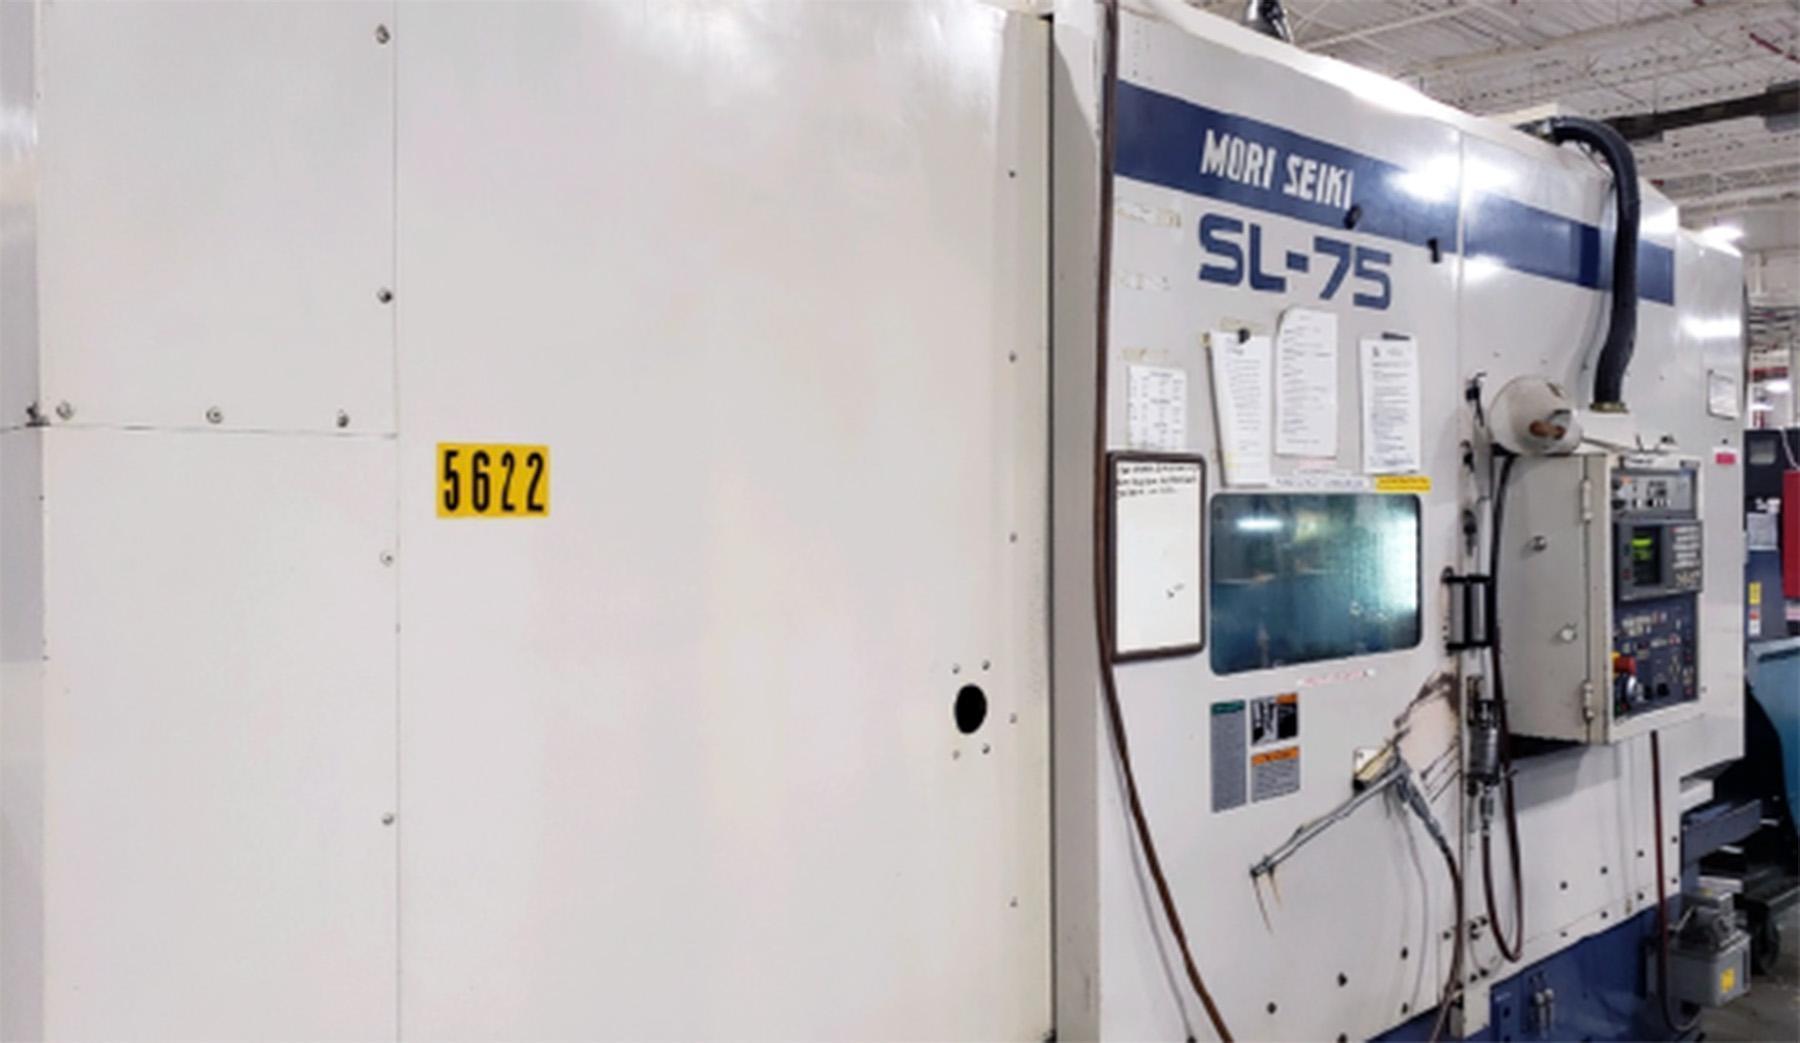 USED, MORI SEIKI SL-75B CNC LATHE